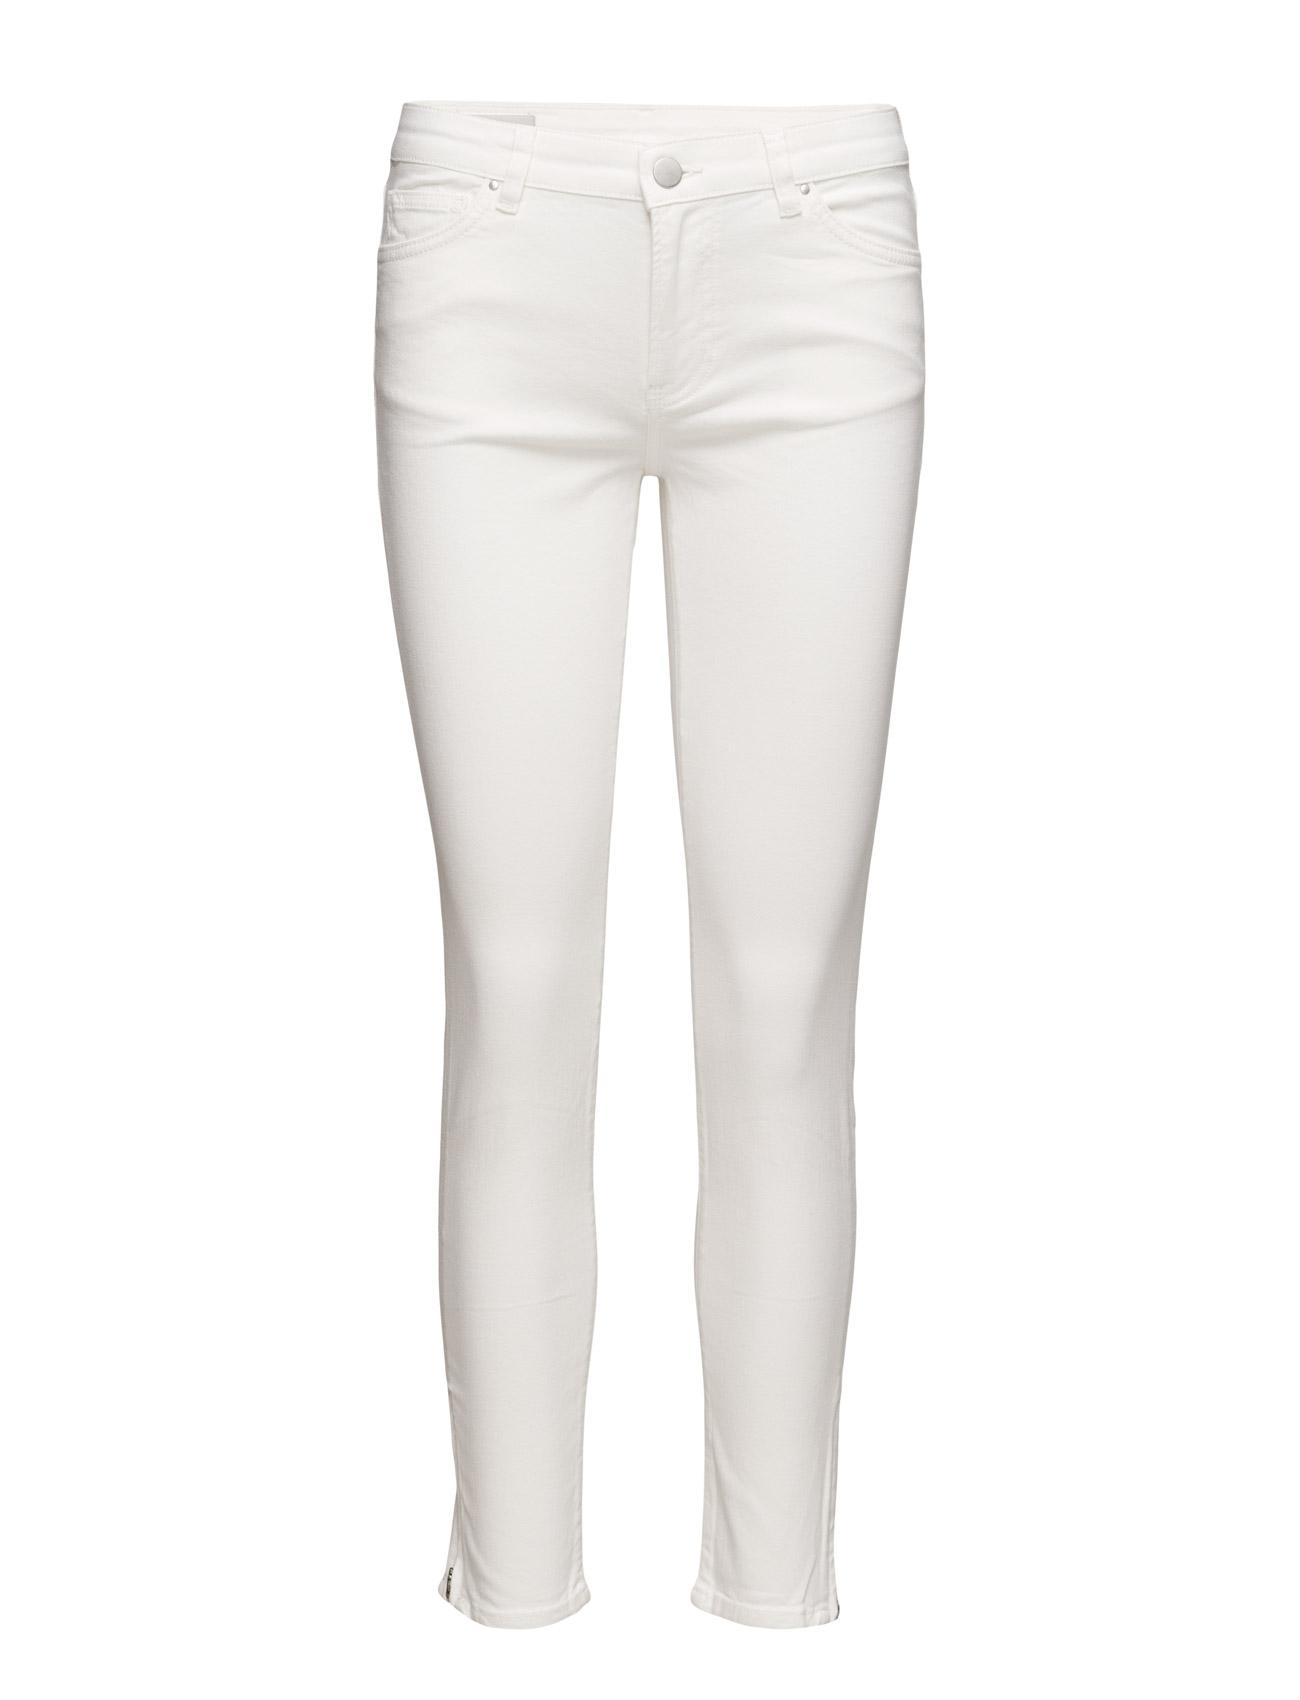 Jean Low Cropped Hw InWear Skinny til Damer i Pure White